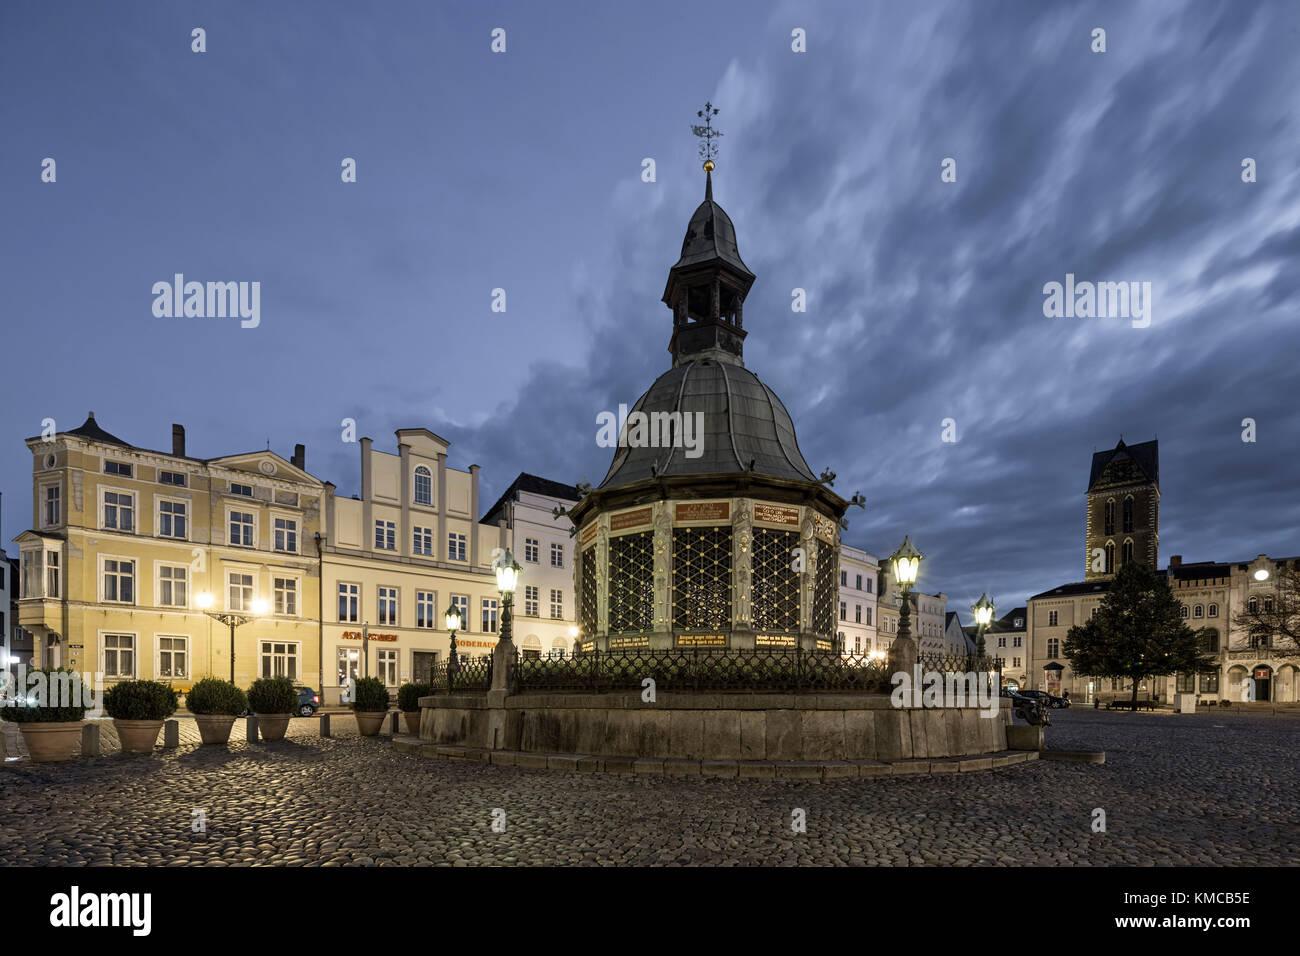 Marketplace of Wismar, Memorial Wasserkunst , Germany - Stock Image